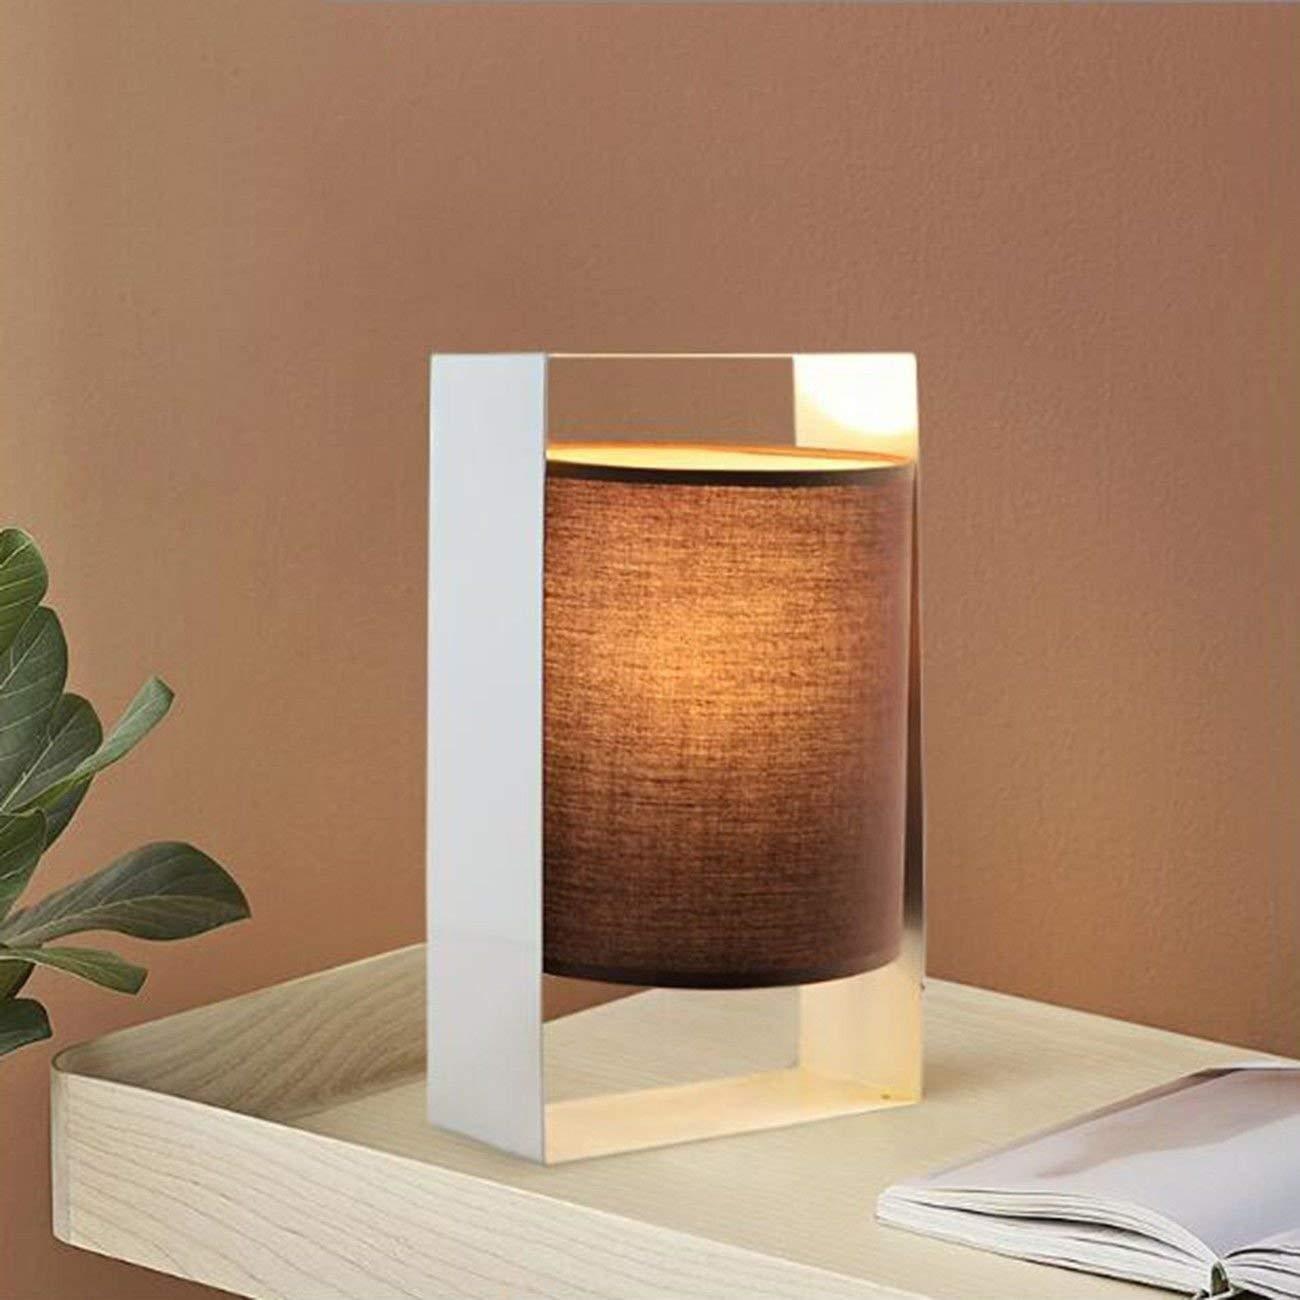 Table lamp Desk Lamp Bedroom Bedside Nordic Cloth Art Creative Personality Simple Geometric White Modern Living Room Desk Lamp,B